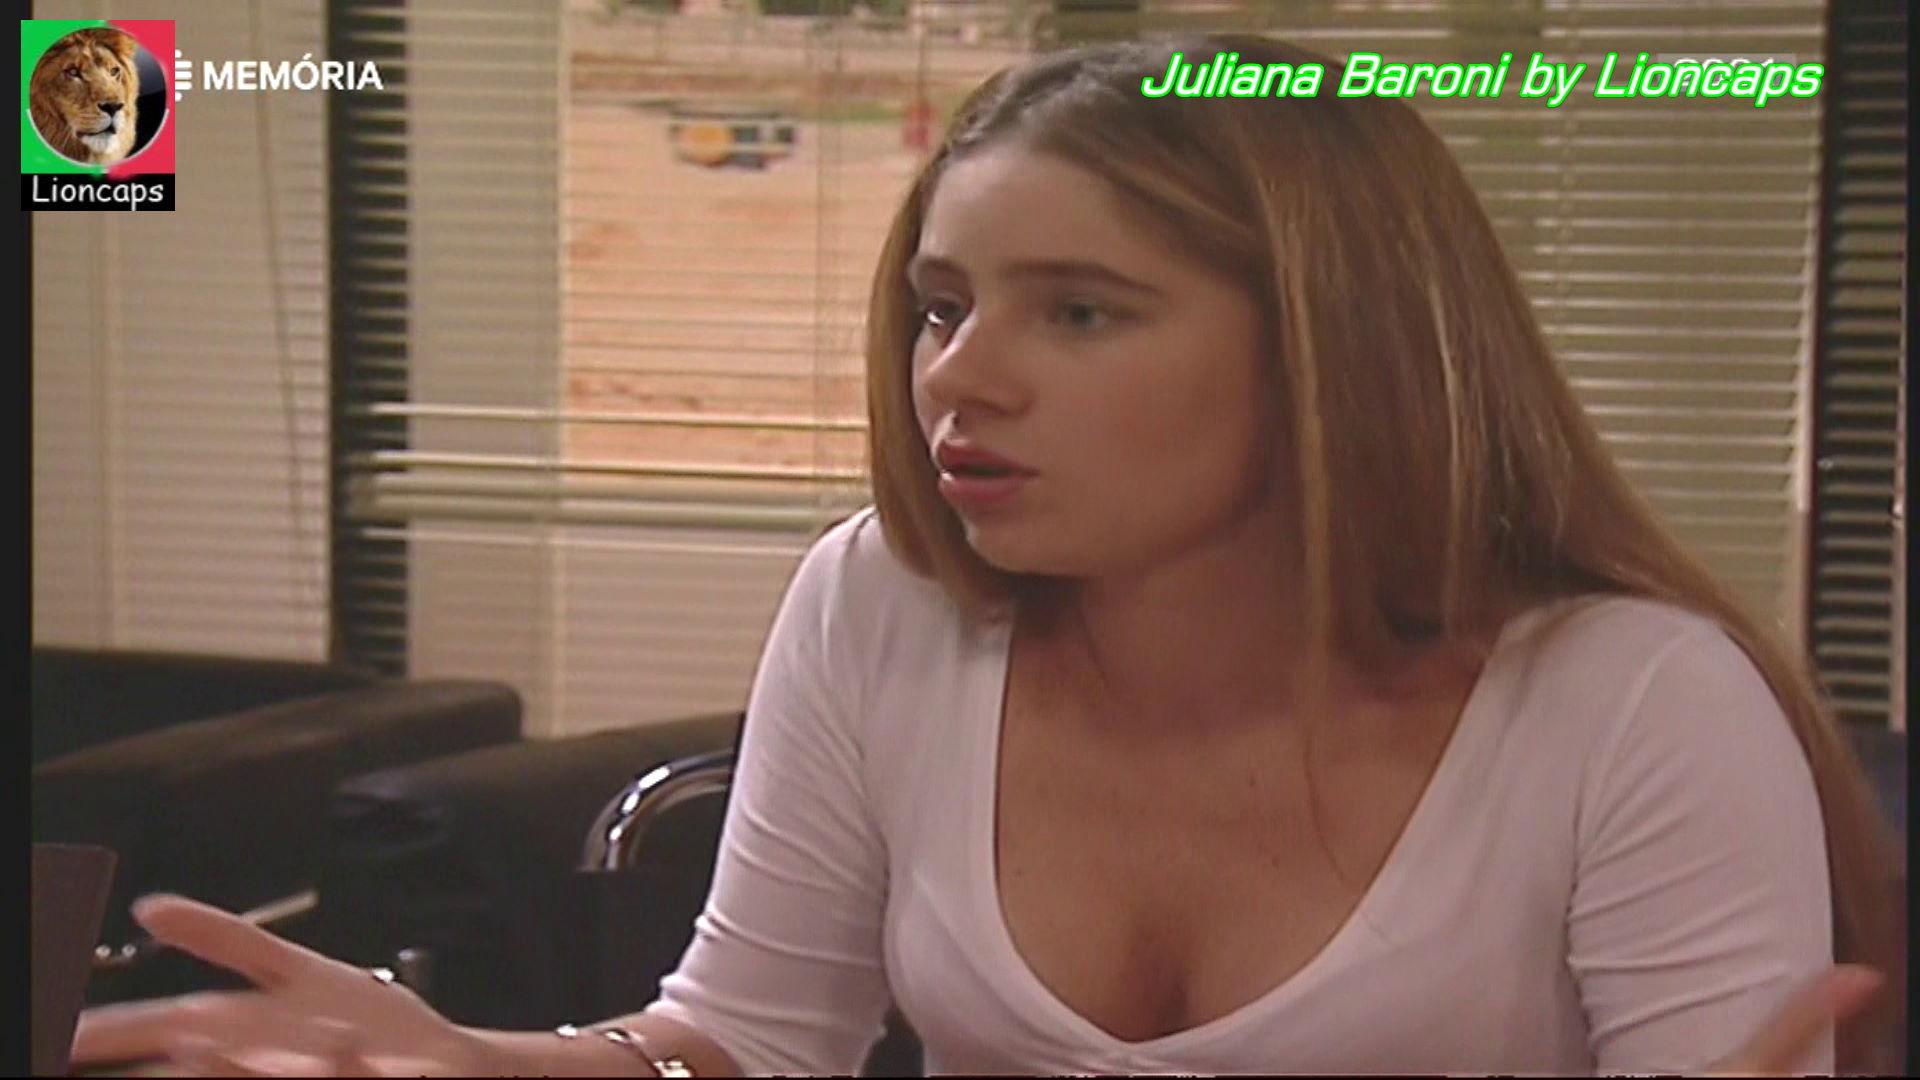 341397427_juliana_baroni_vs180815_0997_122_34lo.JPG